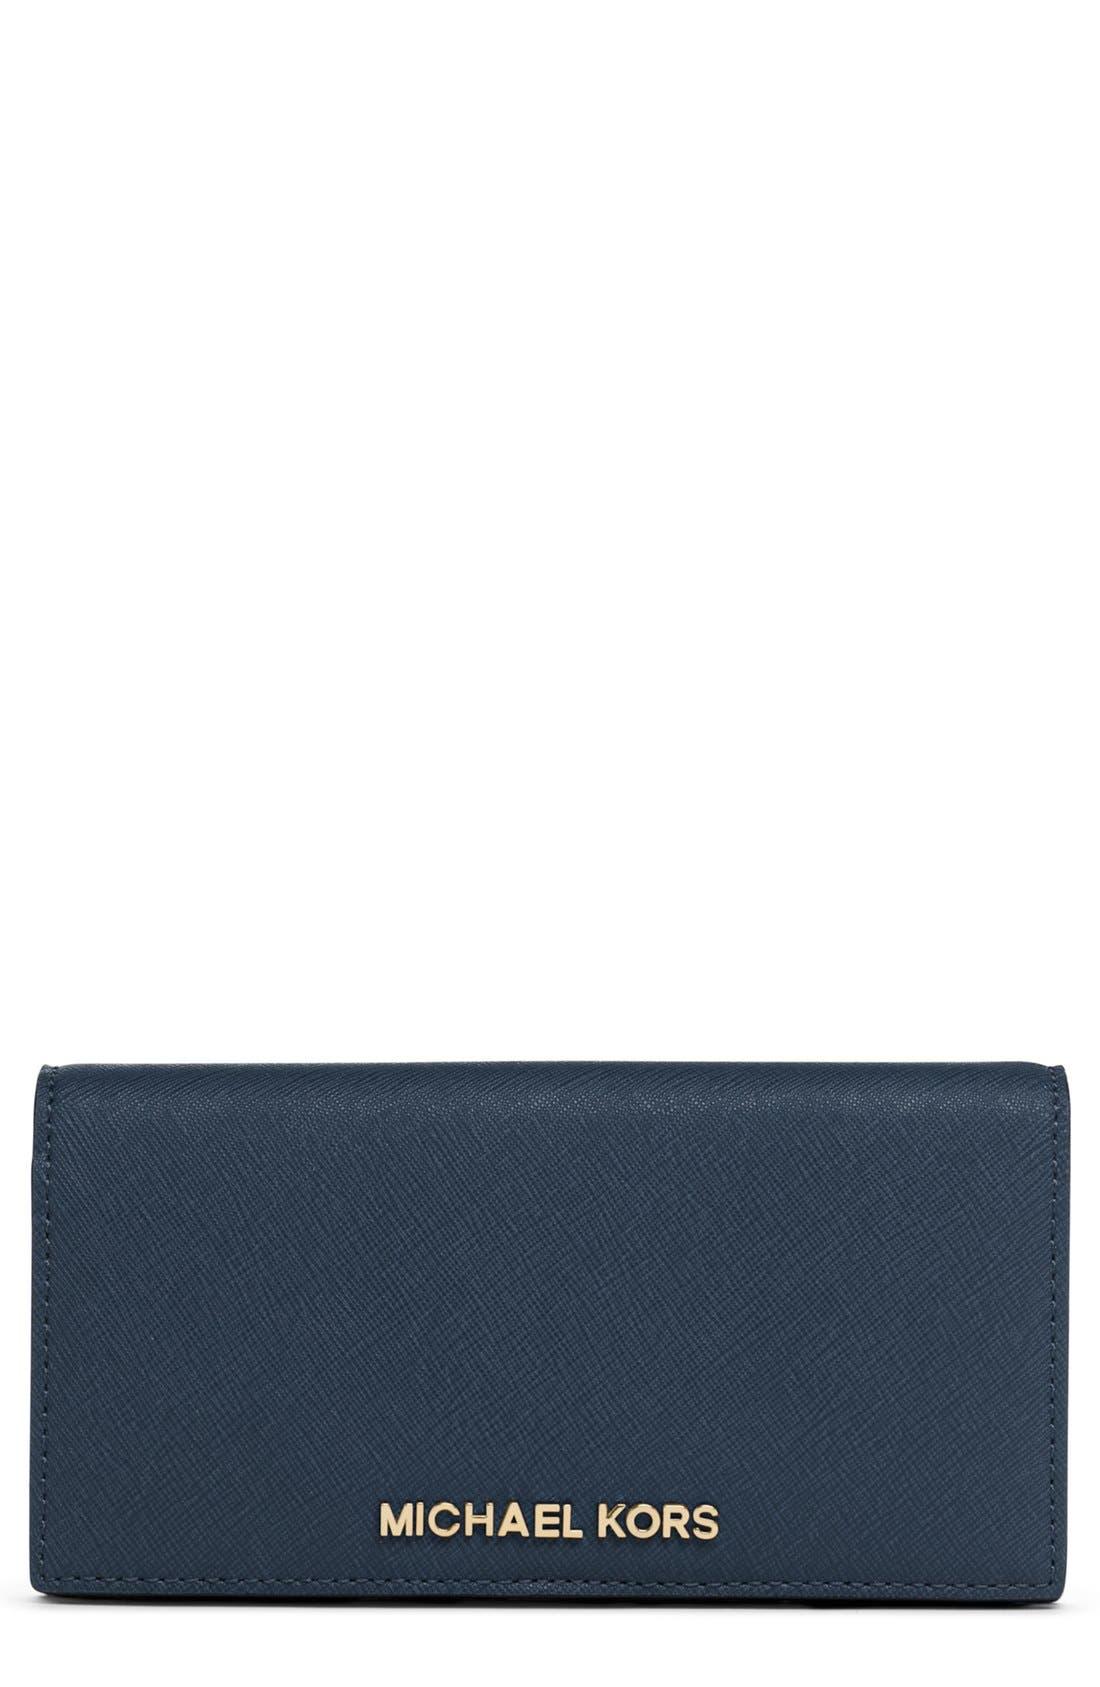 Main Image - MICHAEL Michael Kors 'Jet Set - Slim' Saffiano Leather Wallet